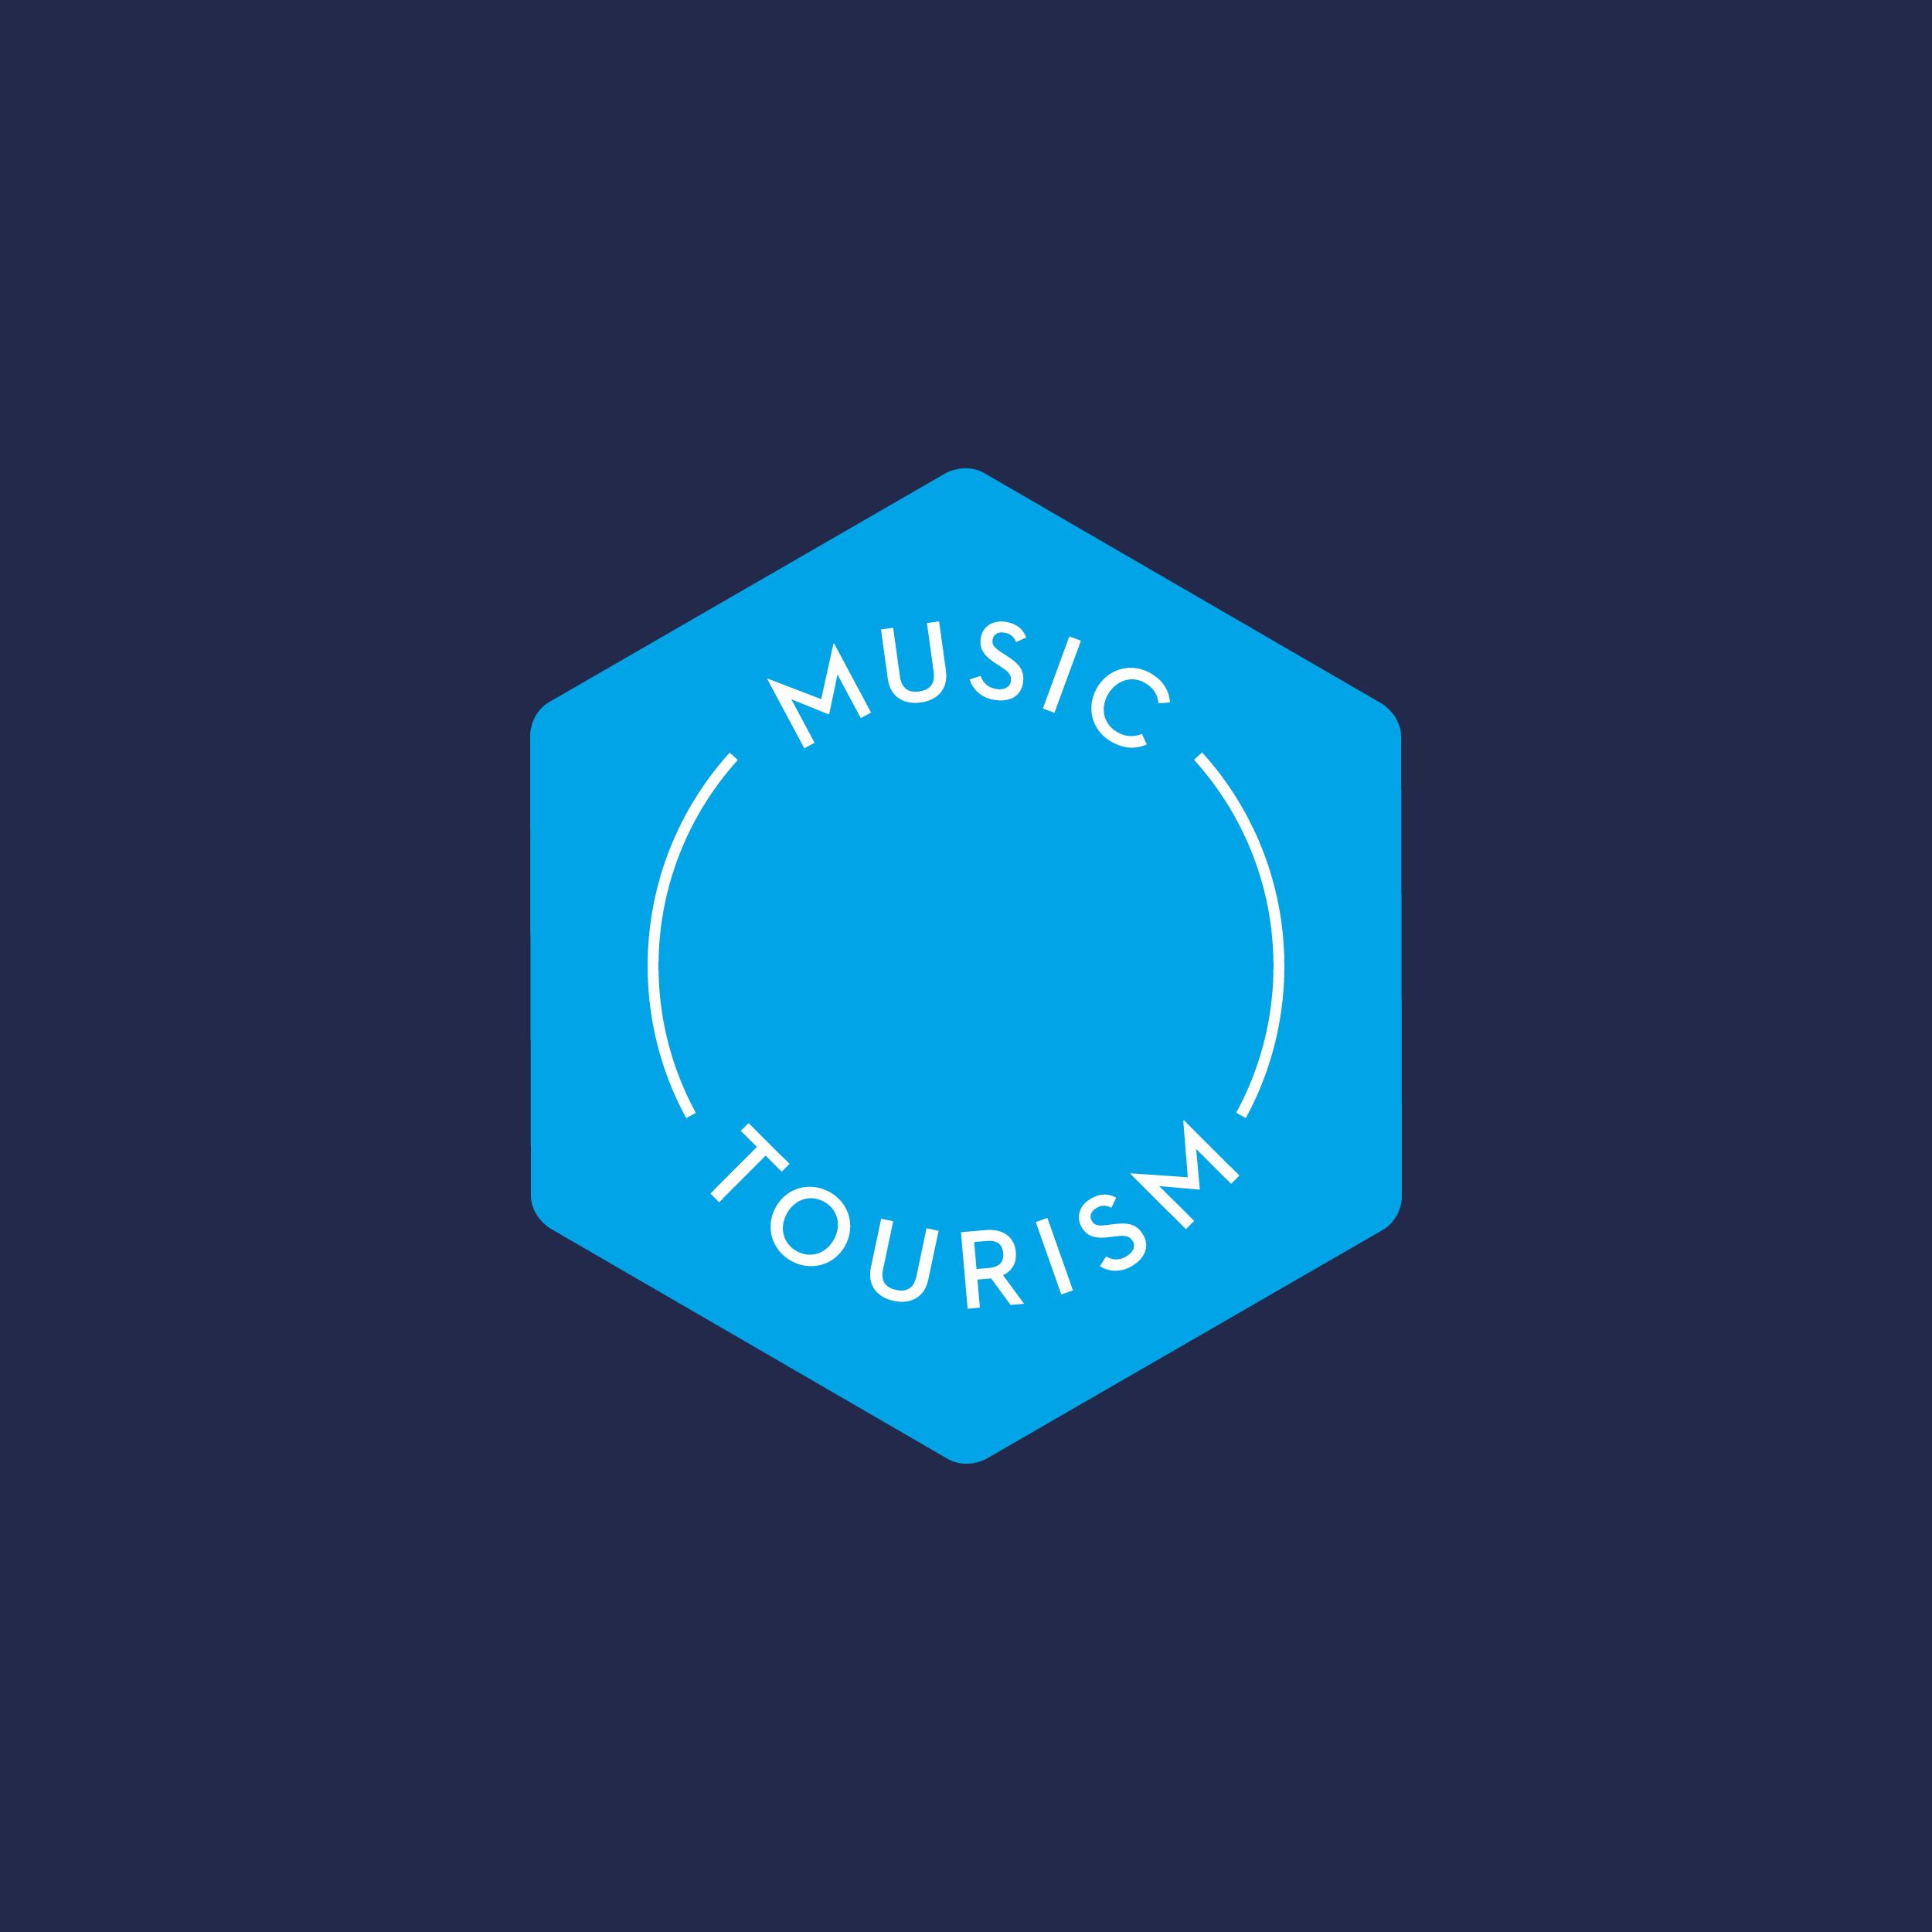 Music Tourism